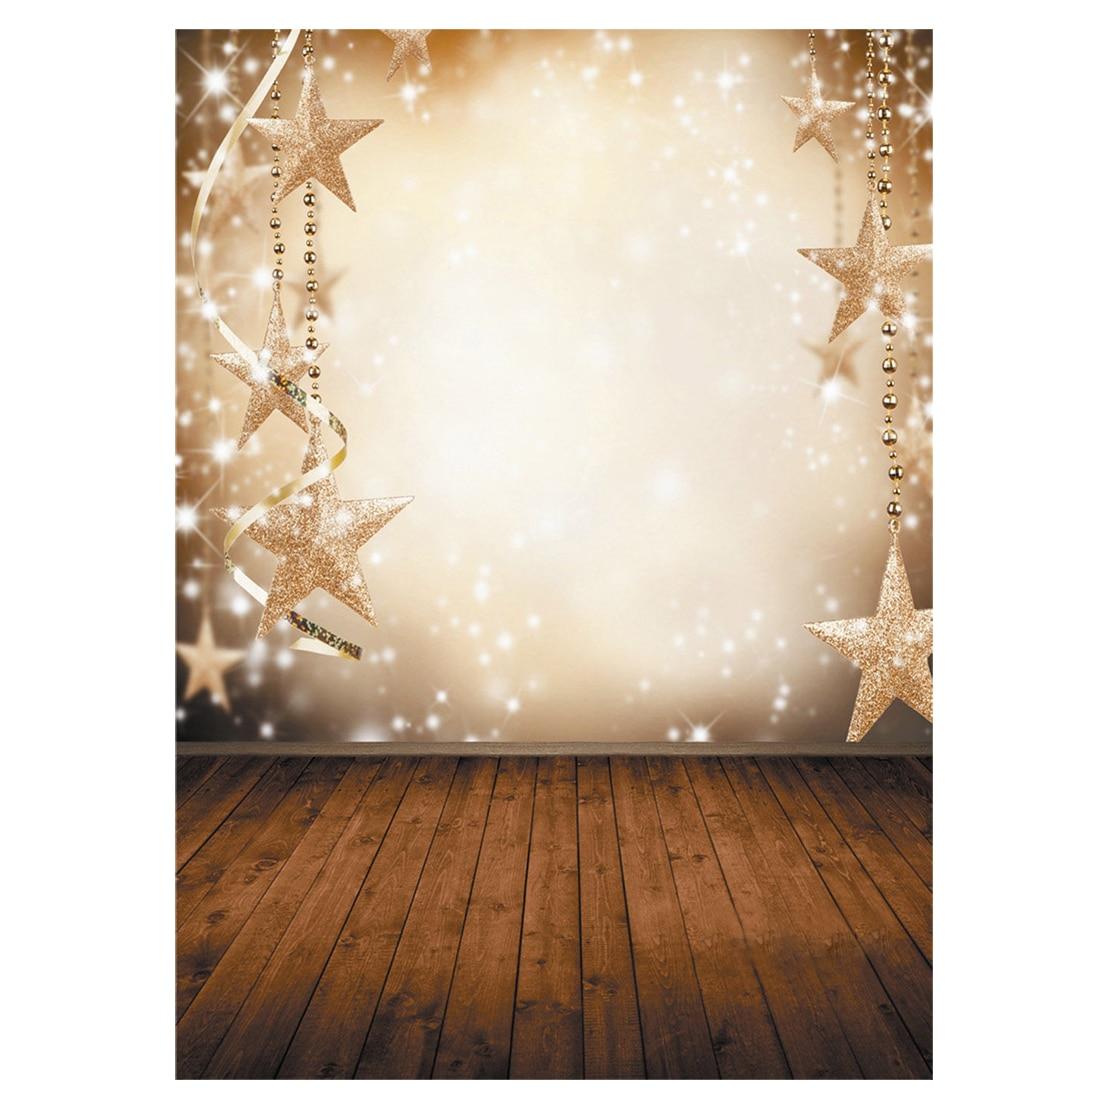 Christmas Thin Vinyl Backdrop Photography Prop Snow Photo Background 5x7ft shengyongbao 300cm 200cm vinyl custom photography backdrops prop christmas background digital ntwu 4041